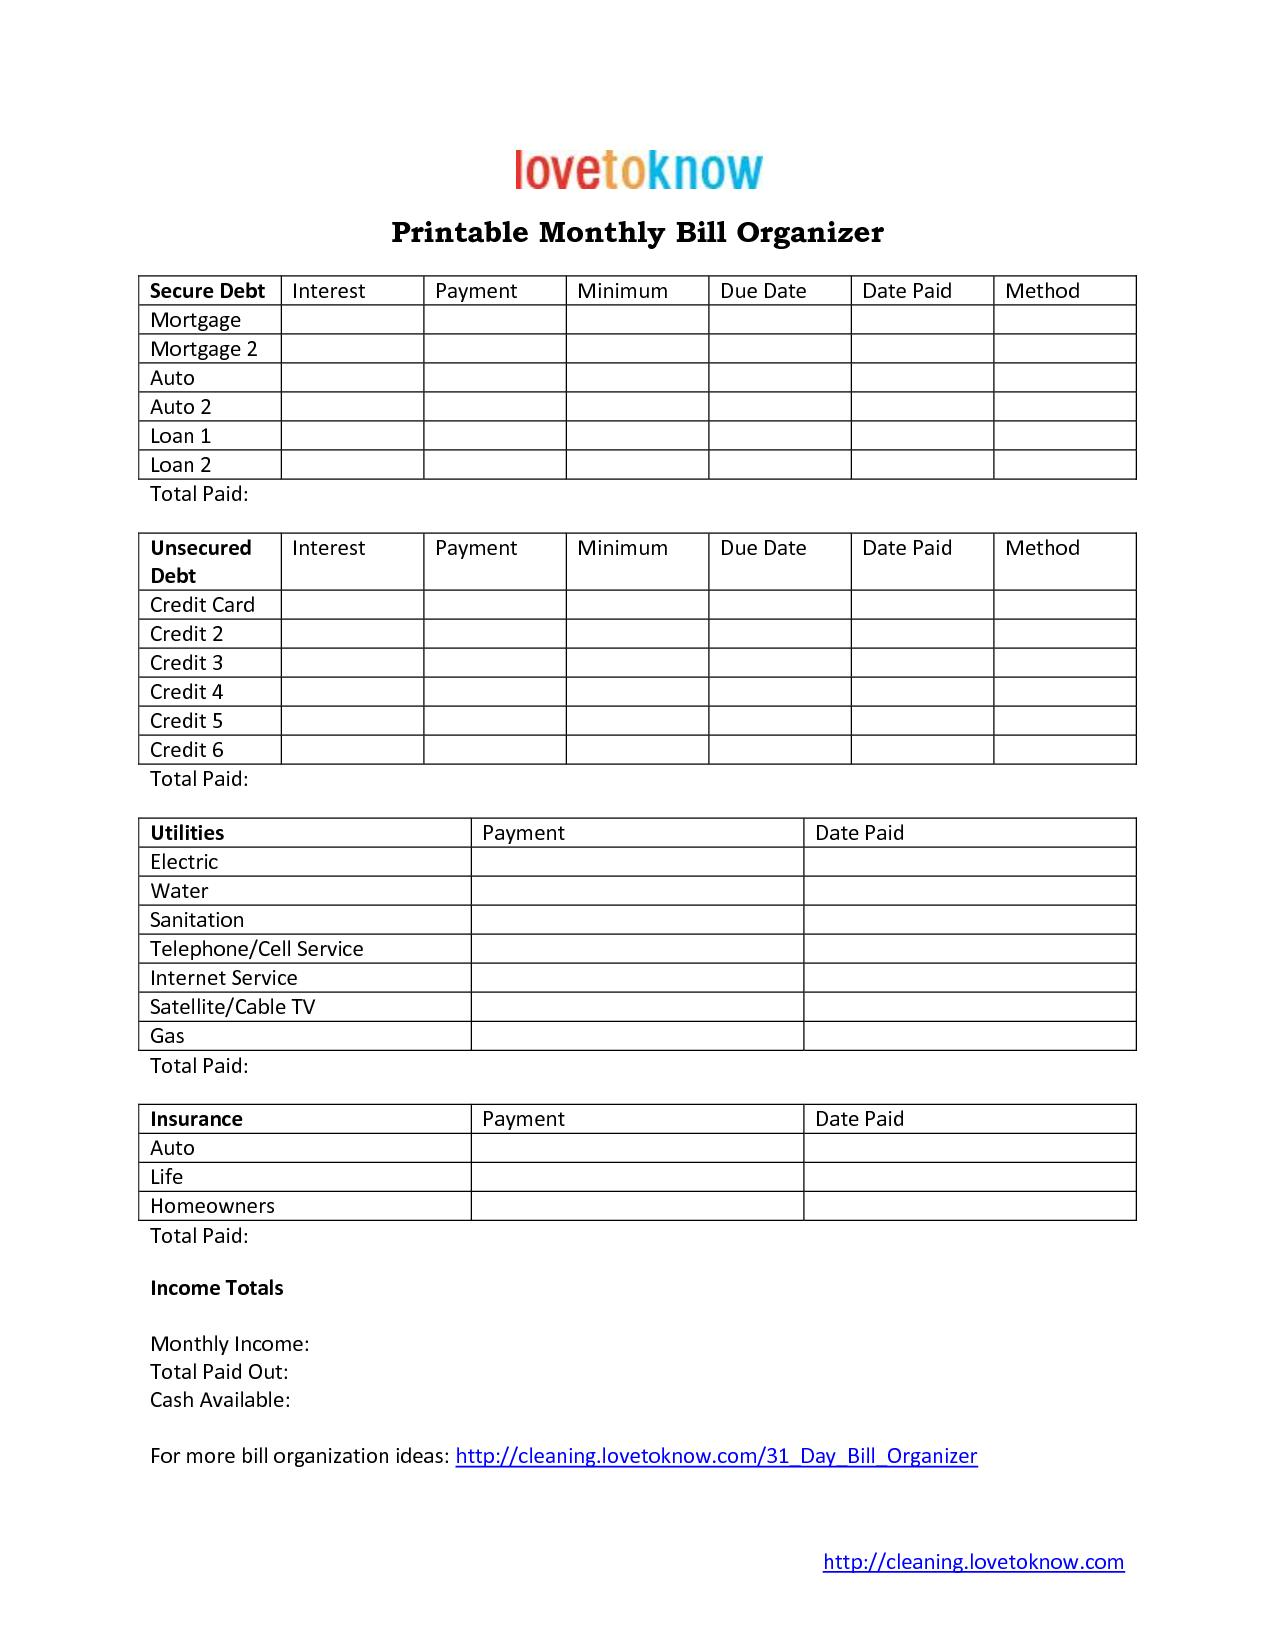 ... Bill Organizer Template, Bill Payment Organizer and Printable Bill